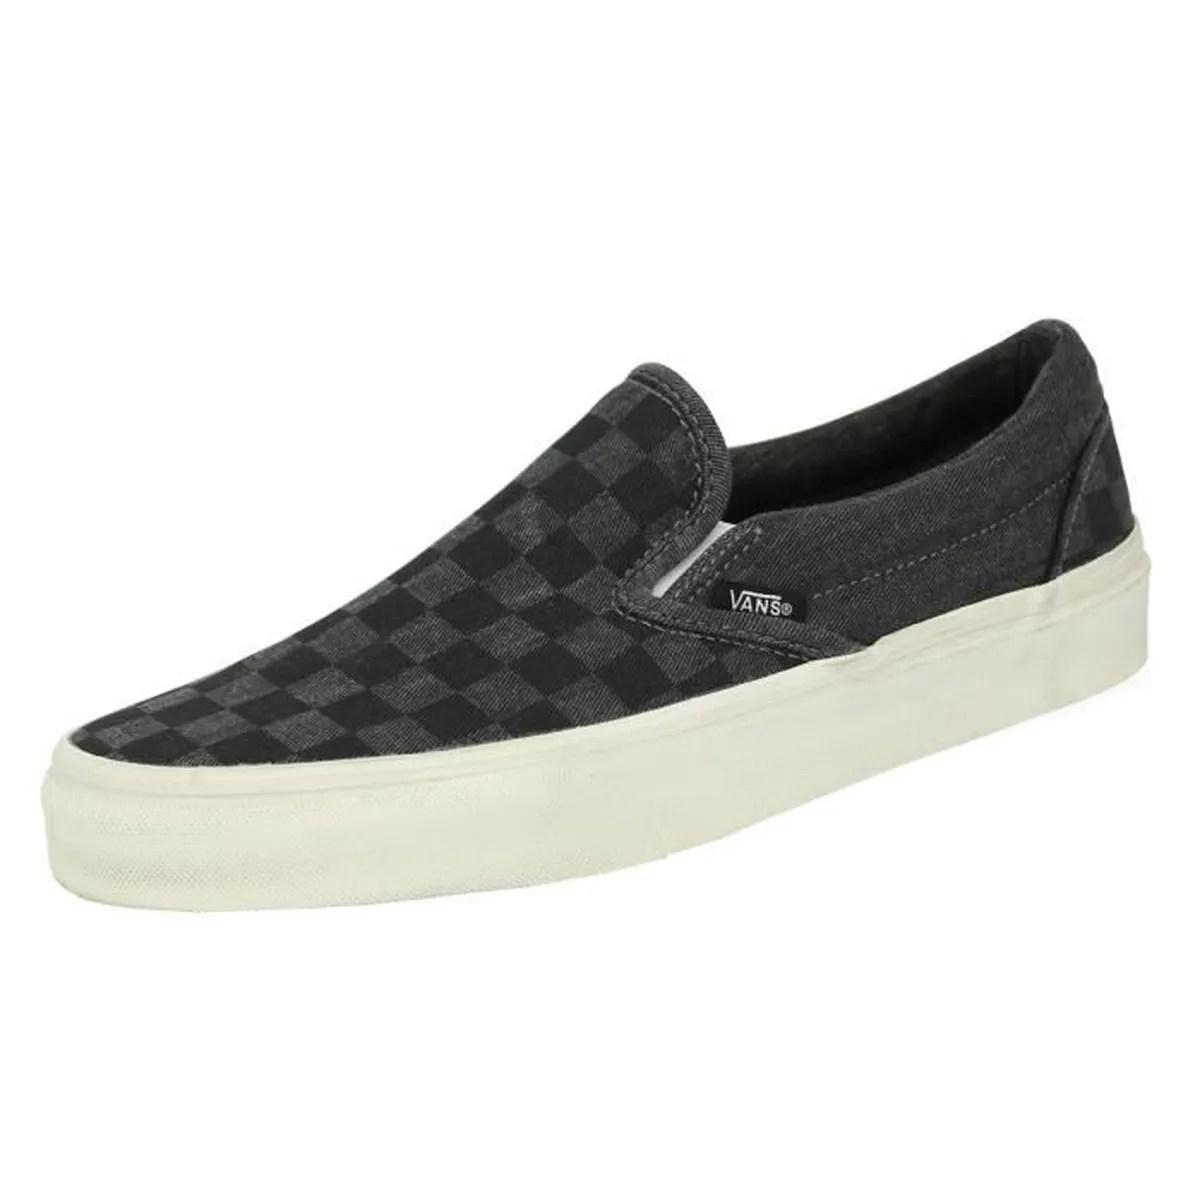 Chaussures Vans Homme Pas Cher